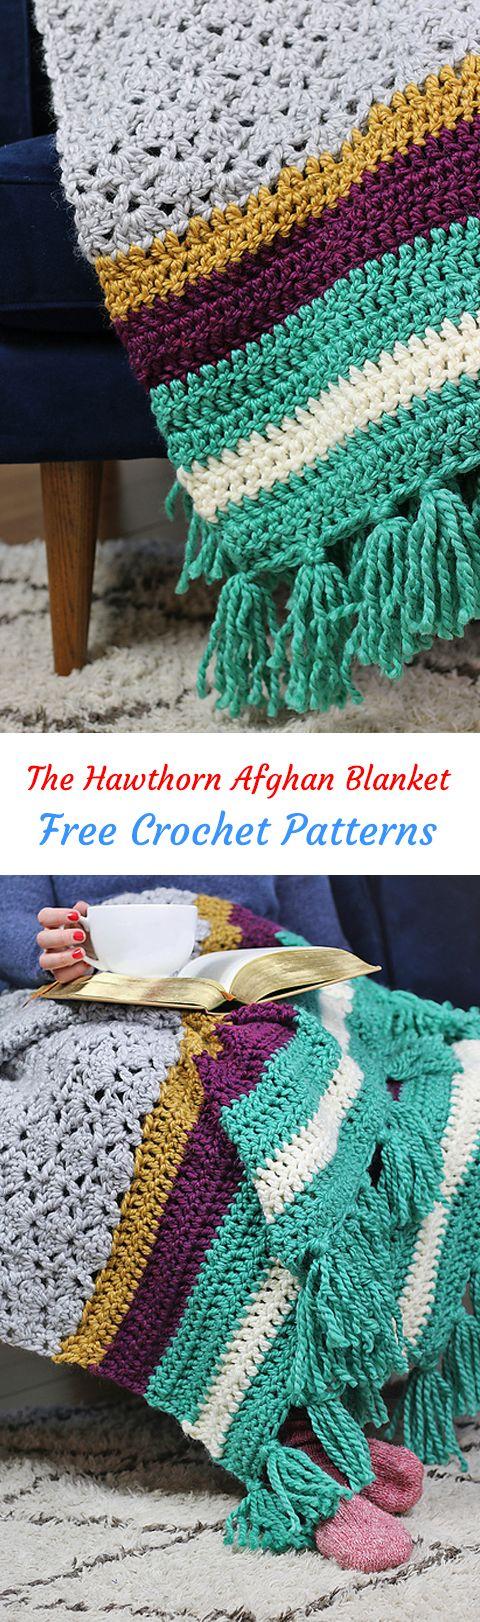 The Hawthorn Afghan Blanket Free Crochet Pattern #crochet #crafts ...